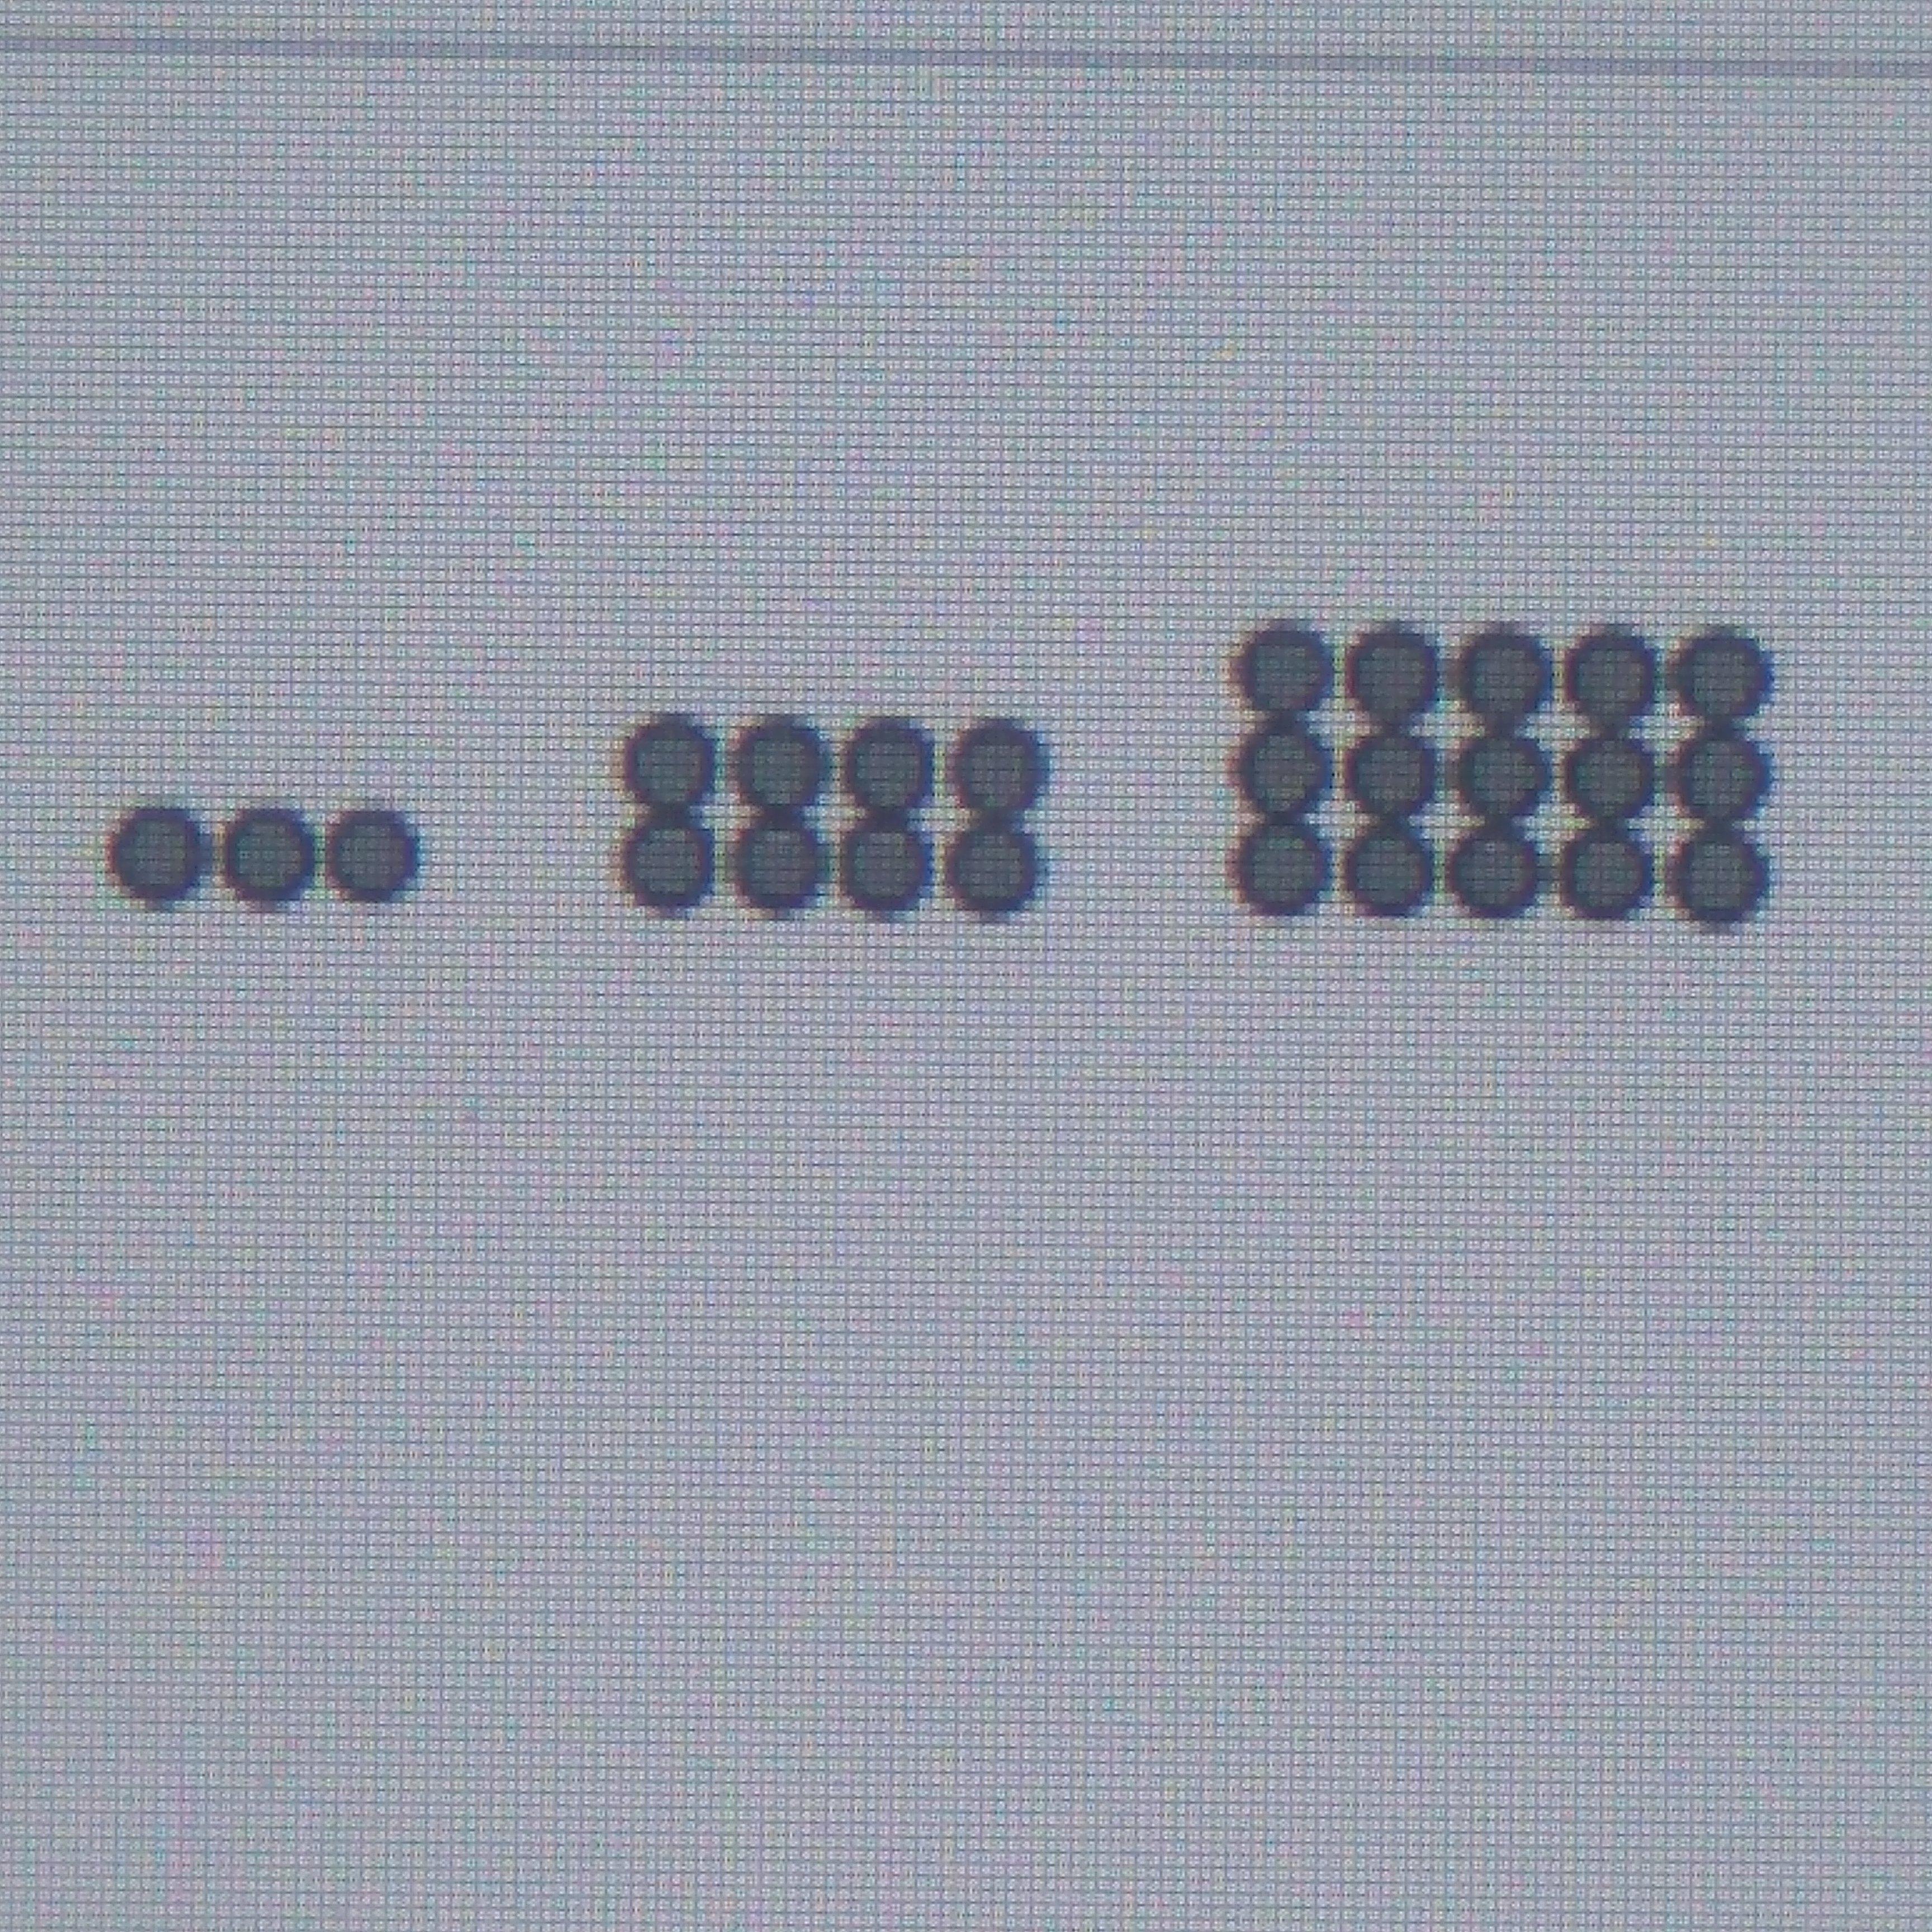 Rumus yang tepat untuk pola bilangan jumlah lingkaran dari ...